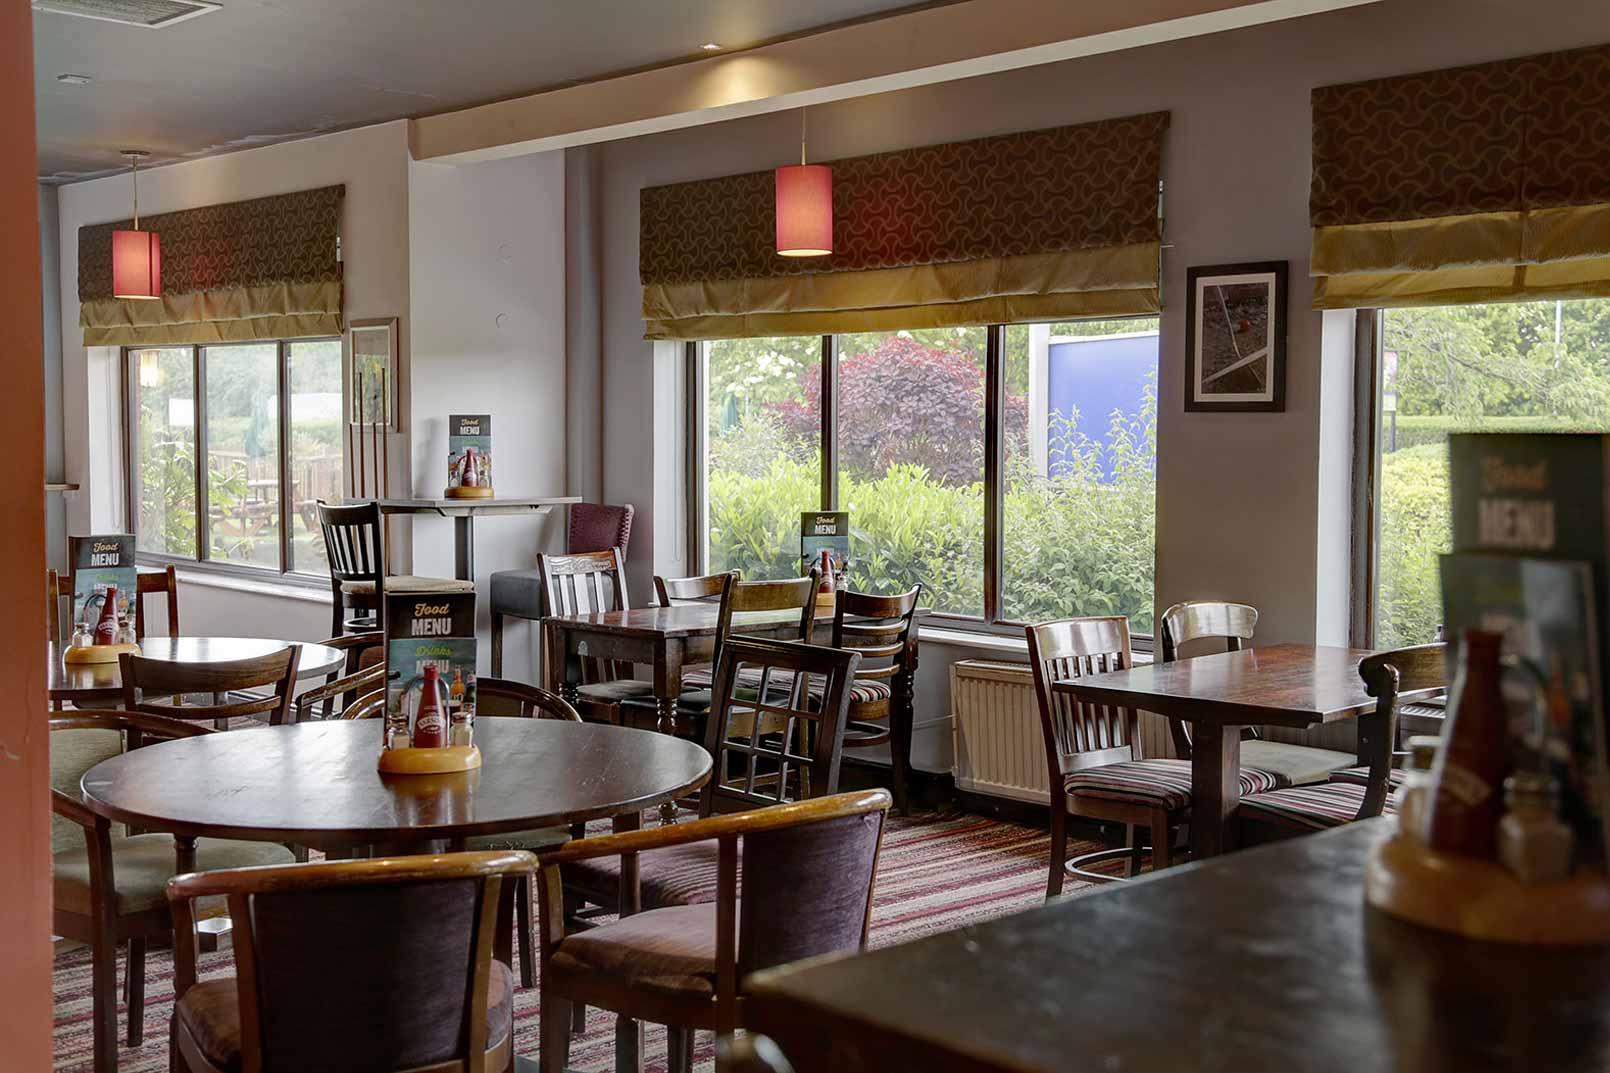 Milton Keynes Hotel Dining 03 83989